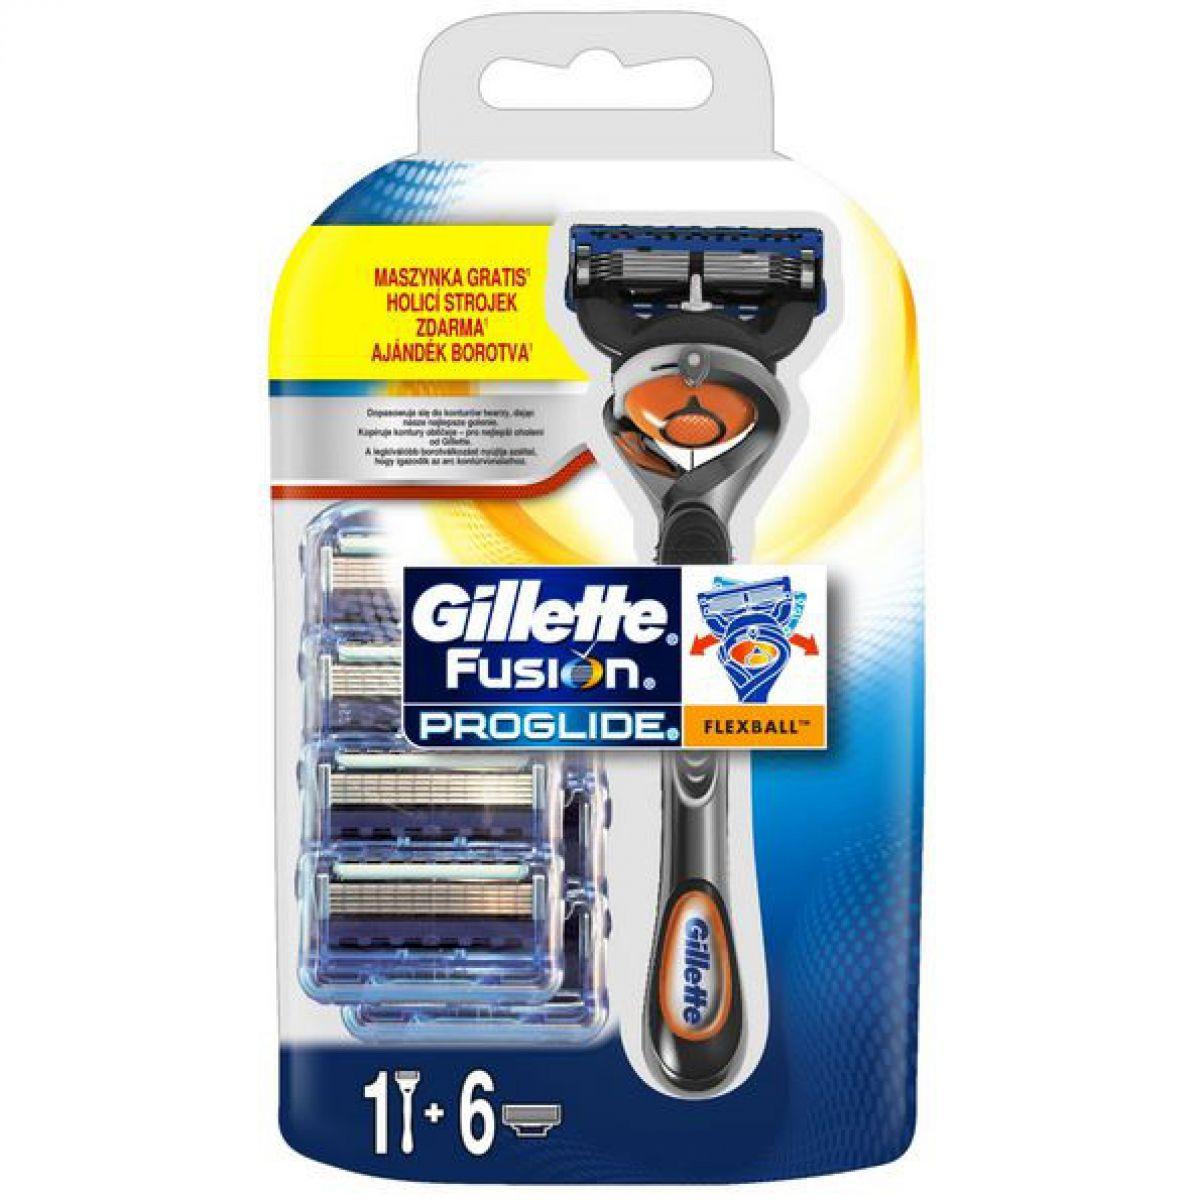 Gillette Fusion Proglide Flexball (7 wymiennych nożyków + rączka gratis) za 65,99PLN @ Super-Pharm